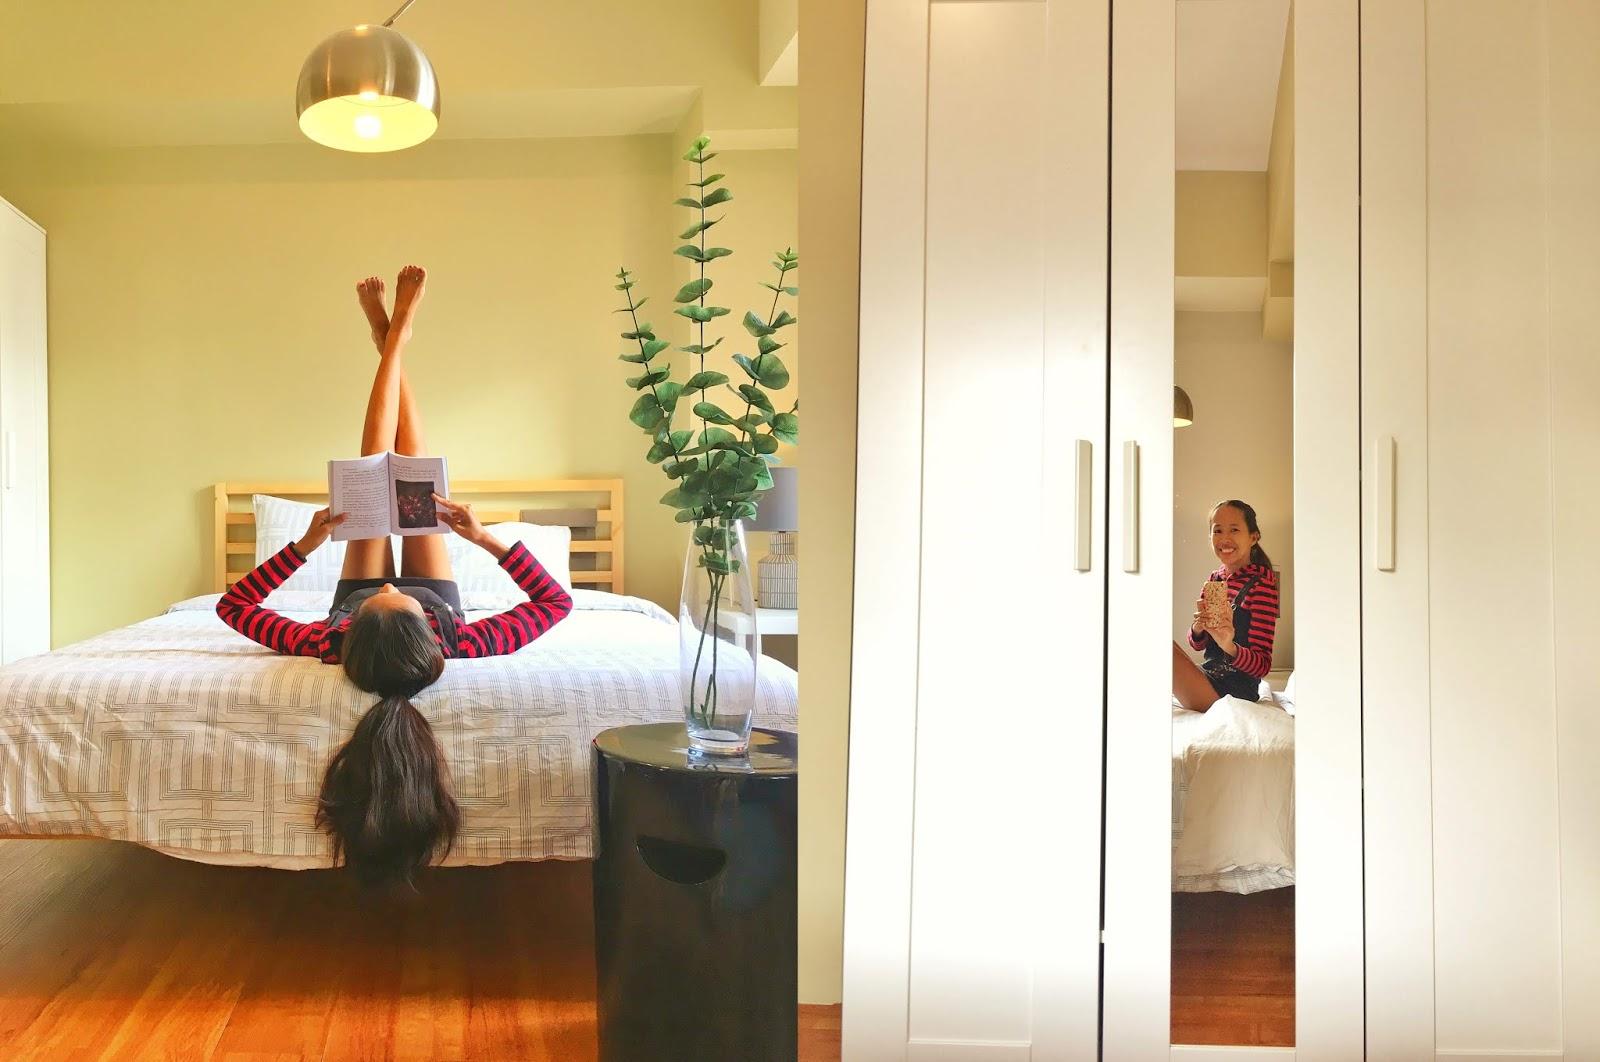 airbnb unit avida cityflex taguig